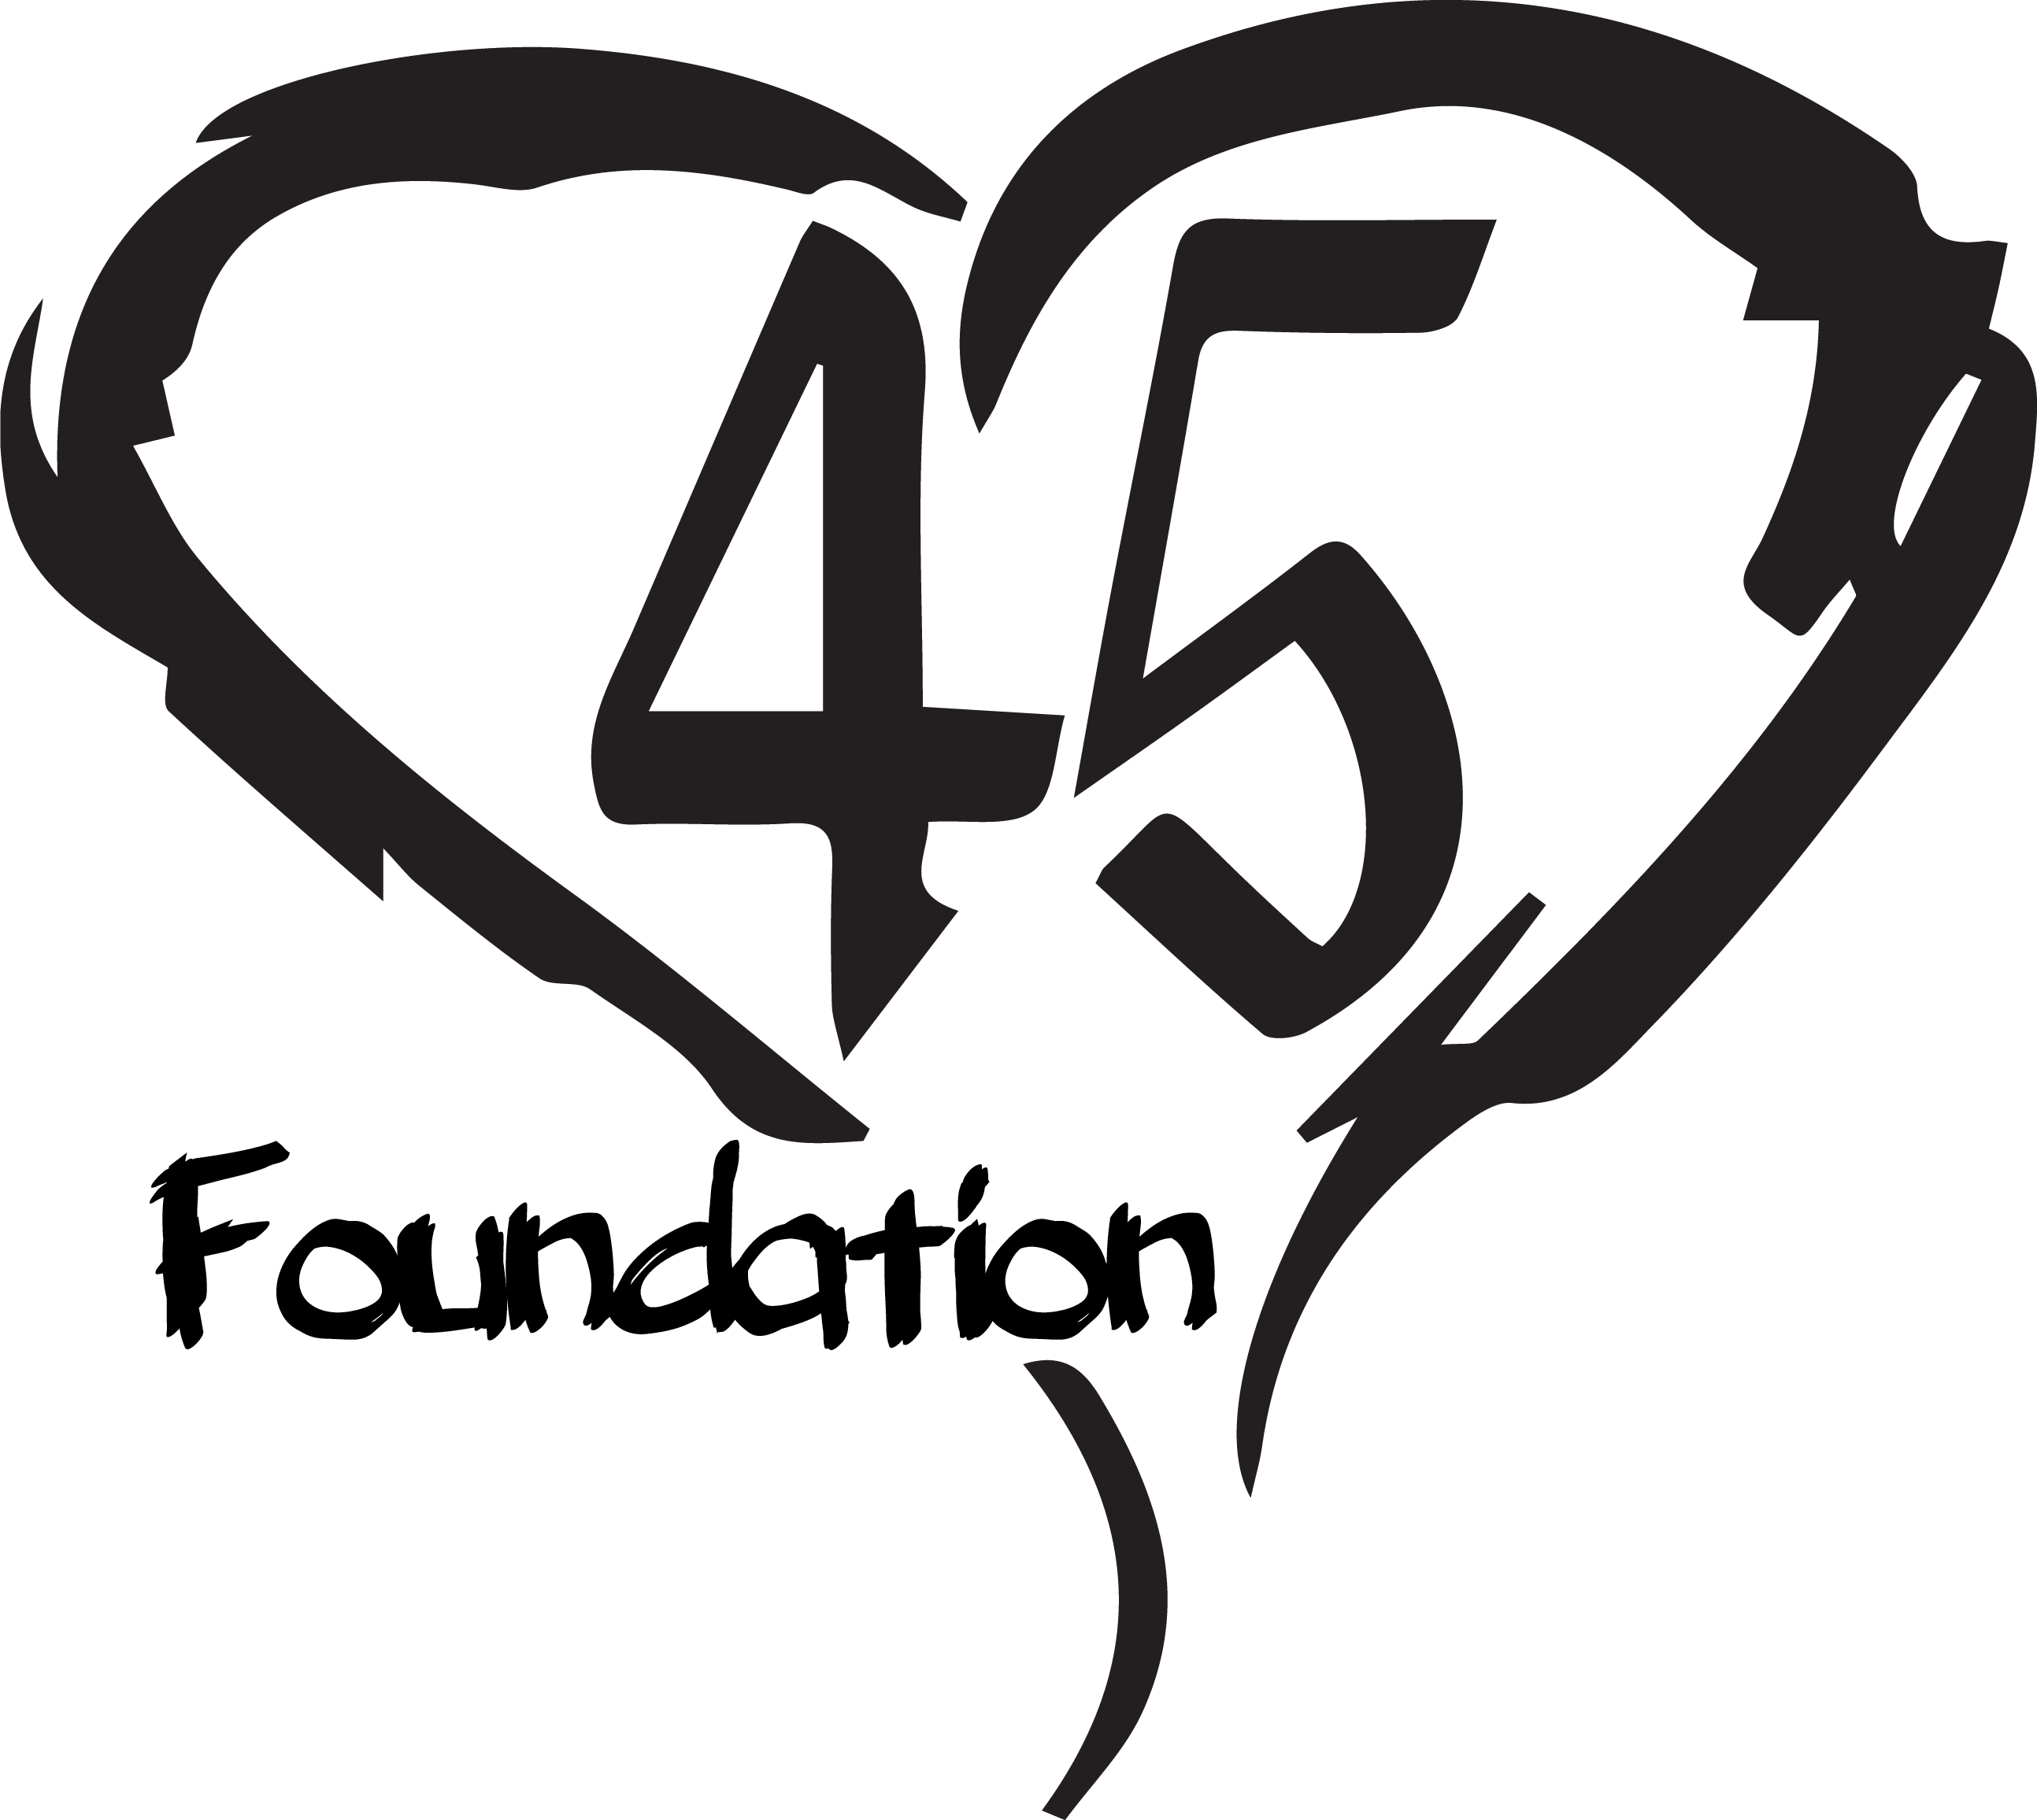 Foundation45